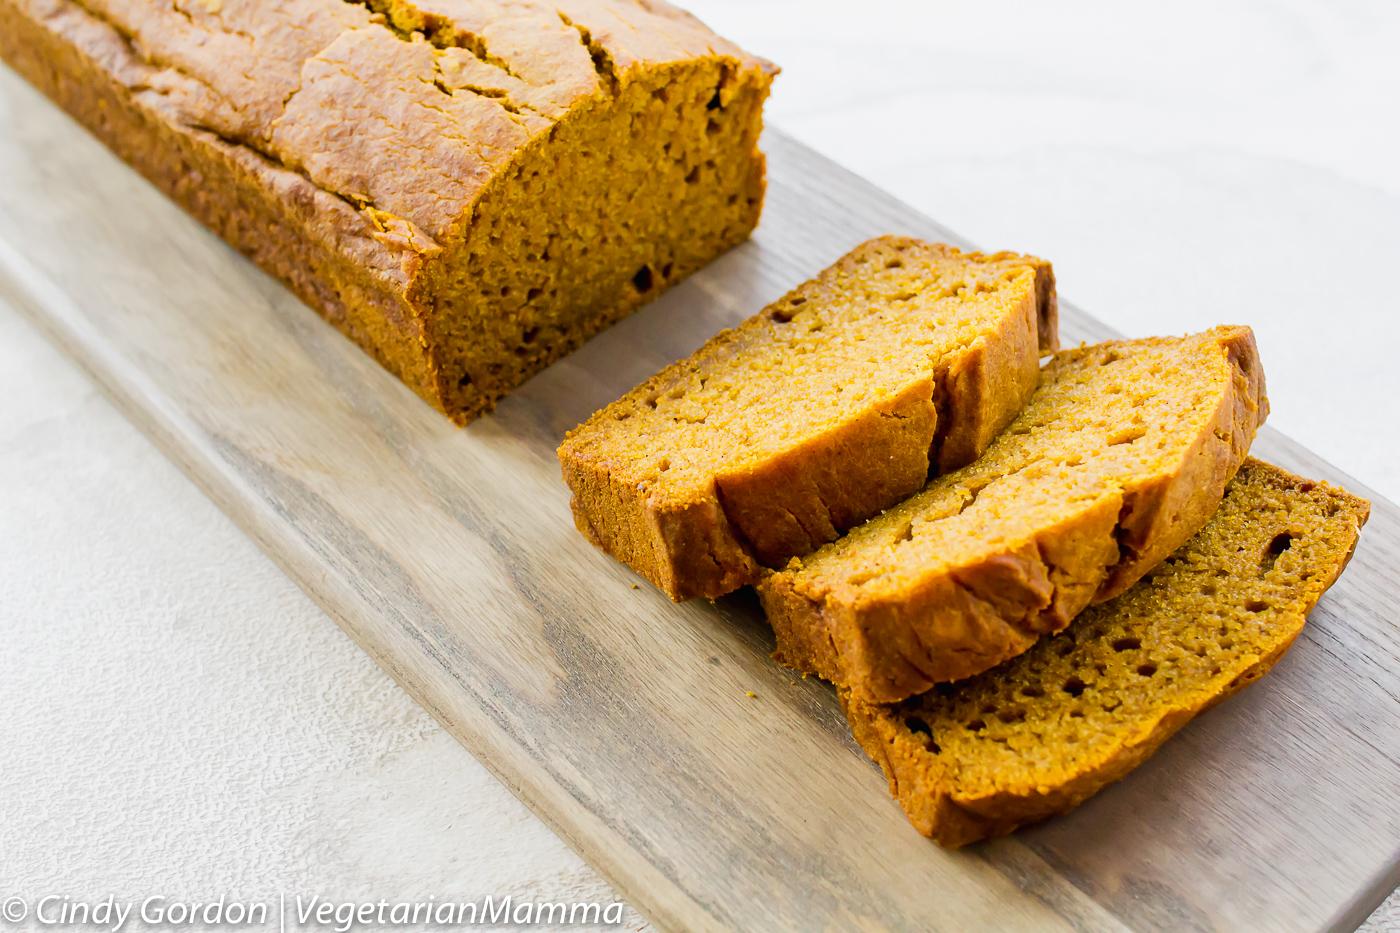 Gluten Free Pumpkin Bread sliced on a cutting board